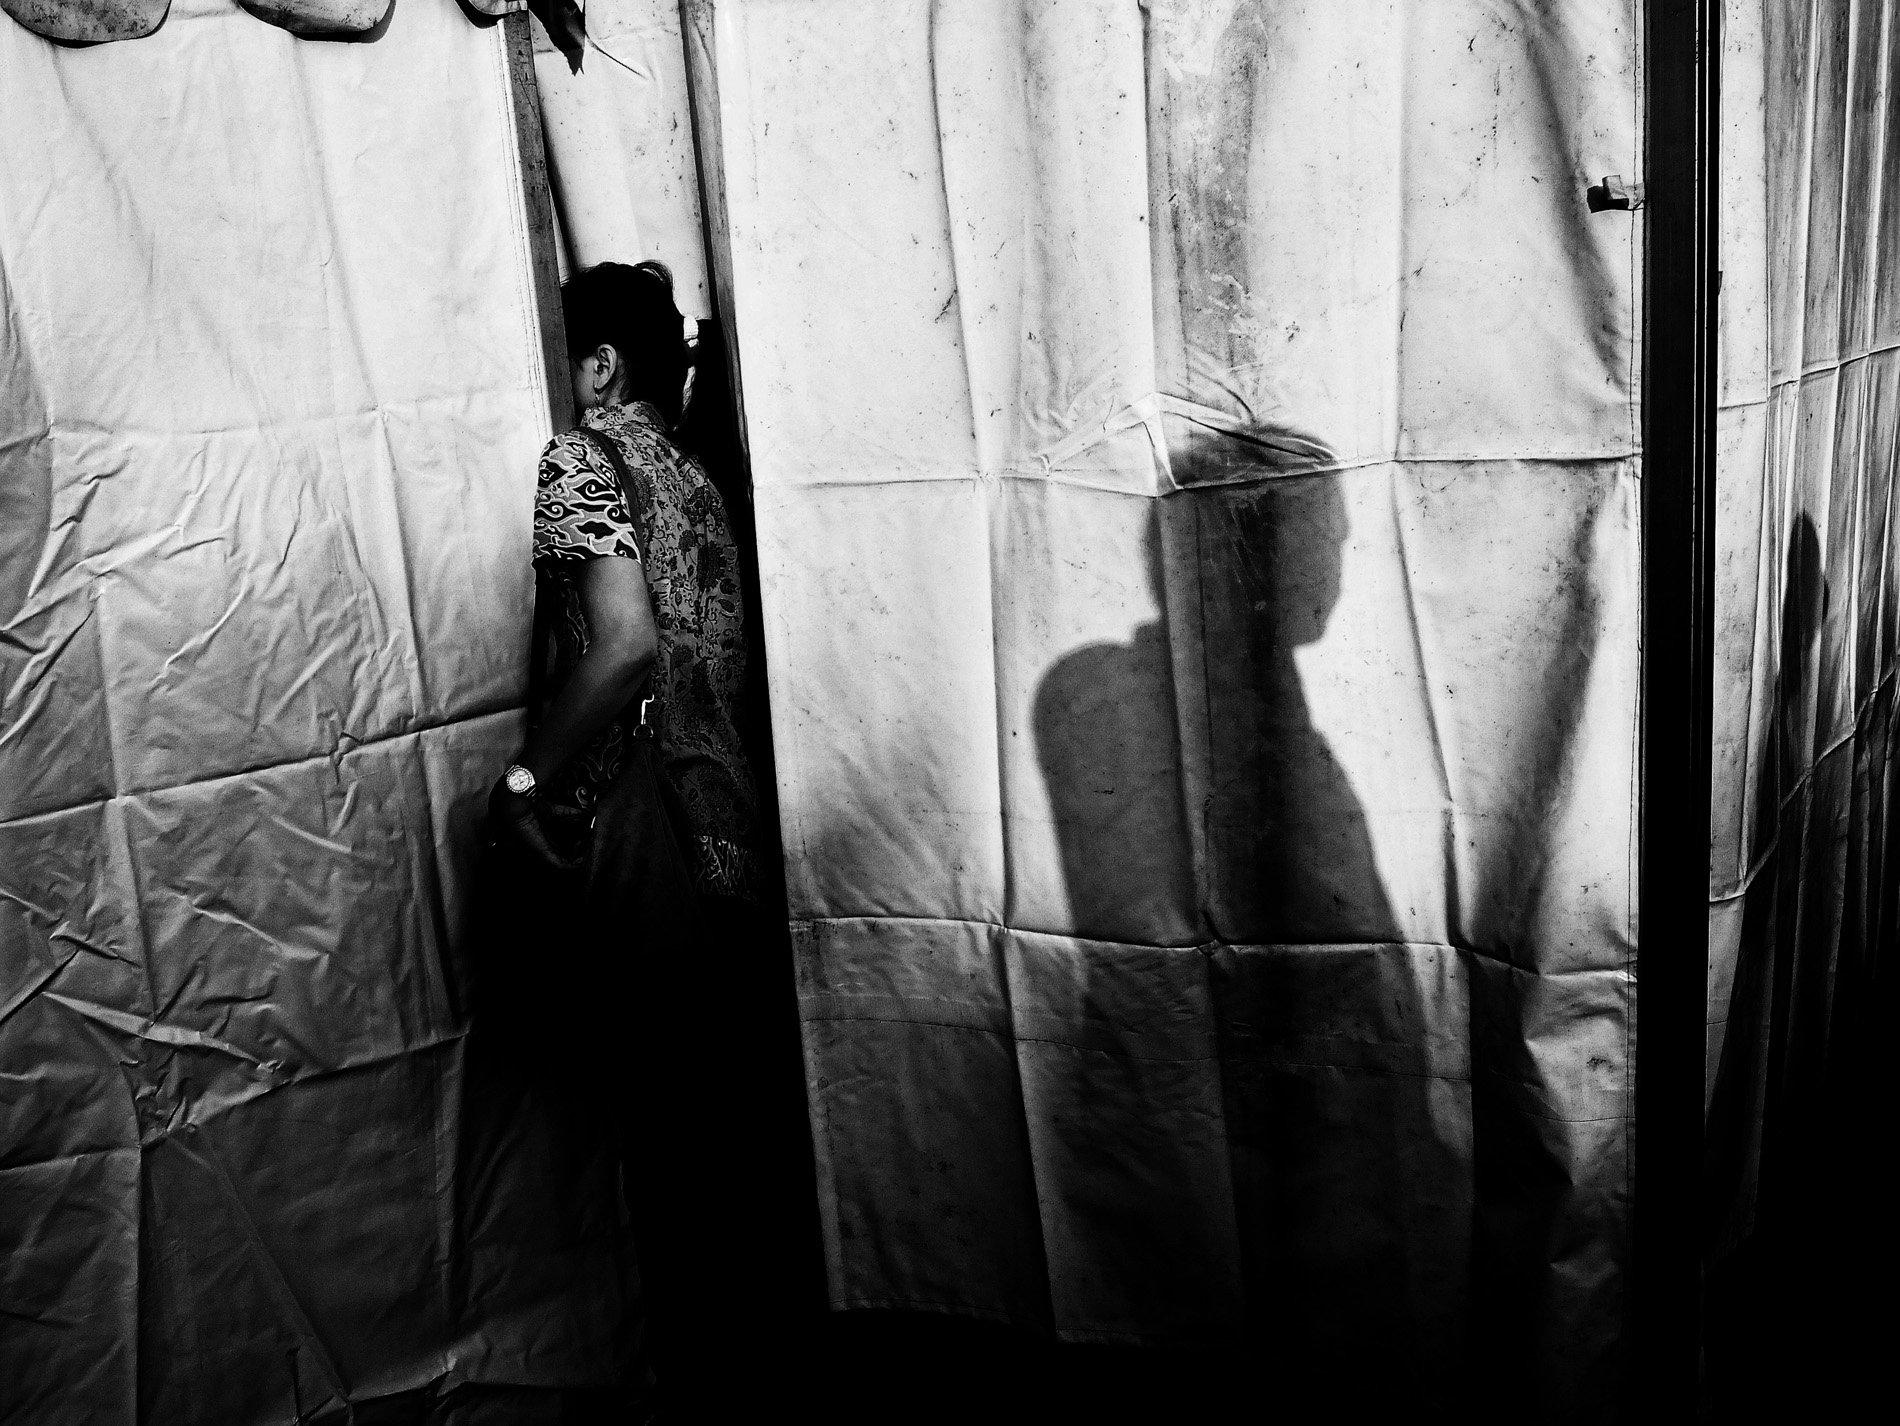 silhouette shadow black & white, contrast photography by Aji Susanto Anom